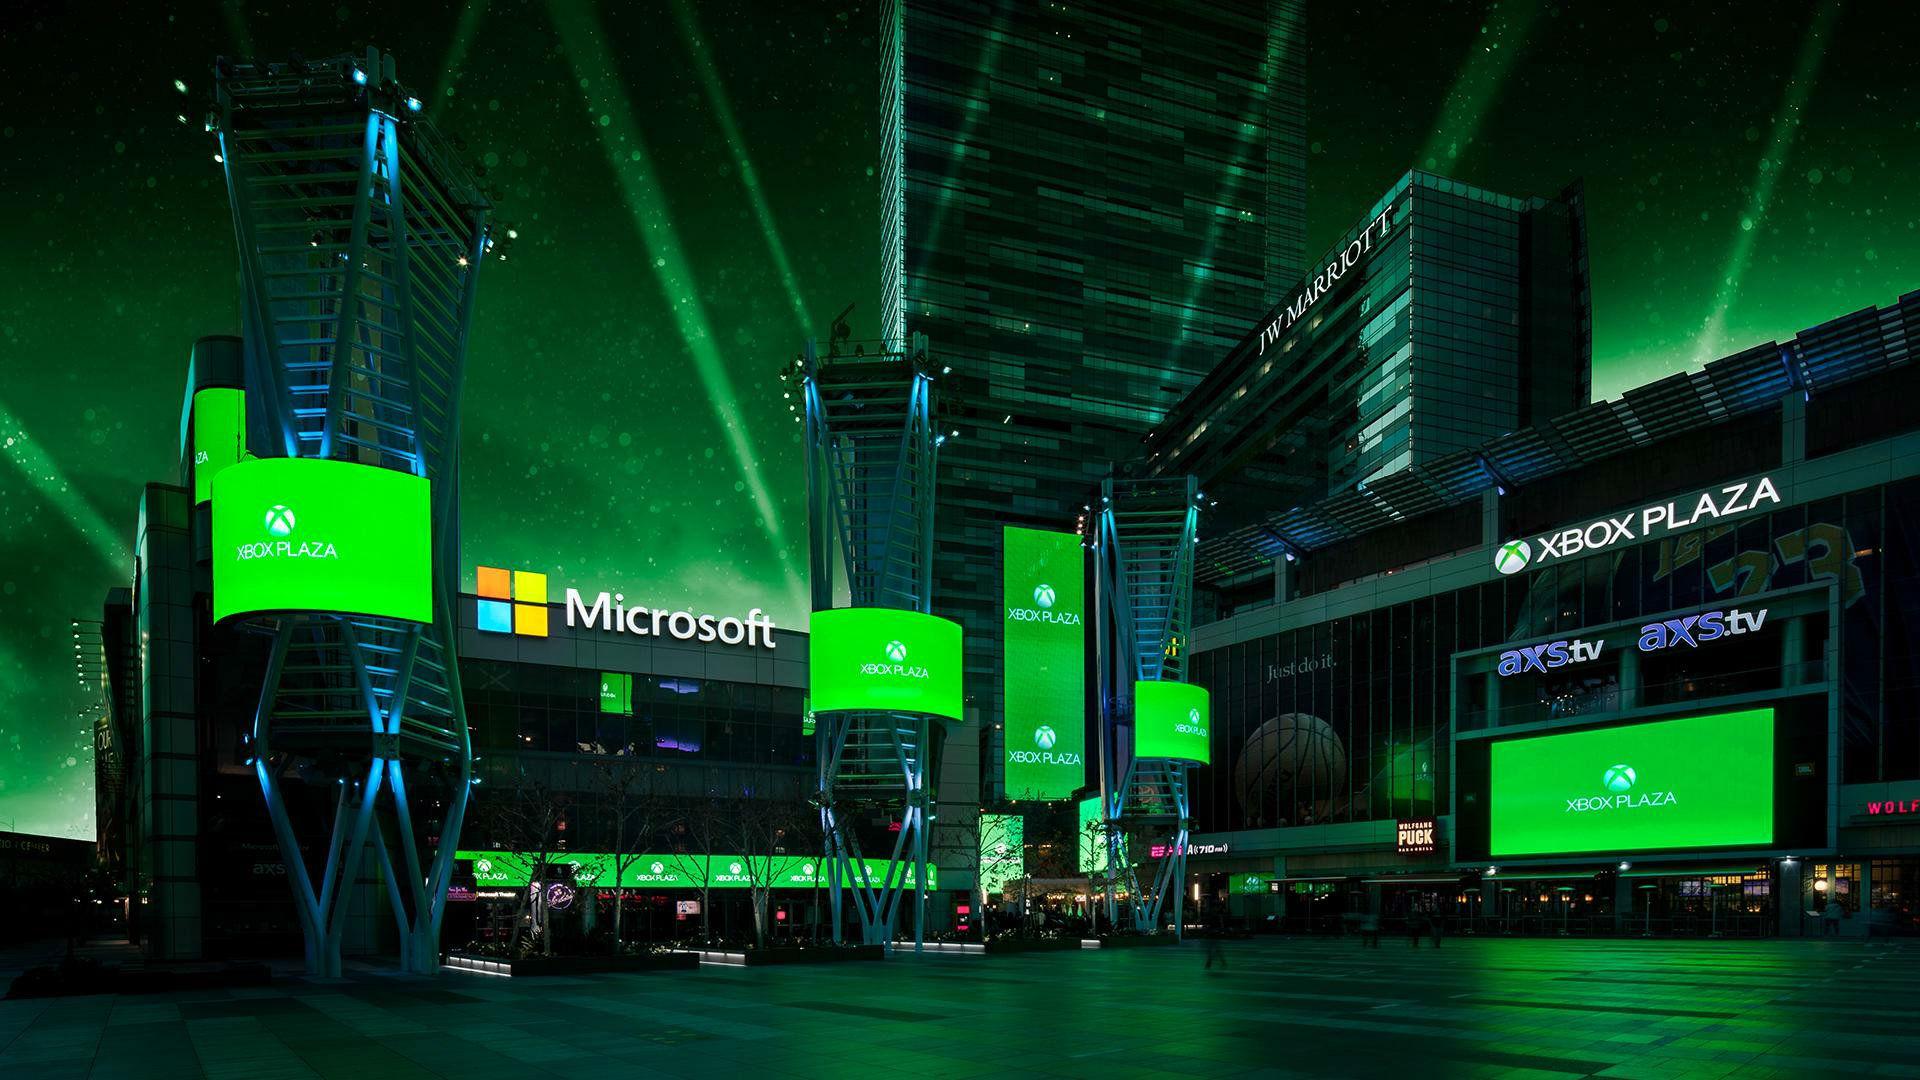 Xbox is still going to E3 screenshot